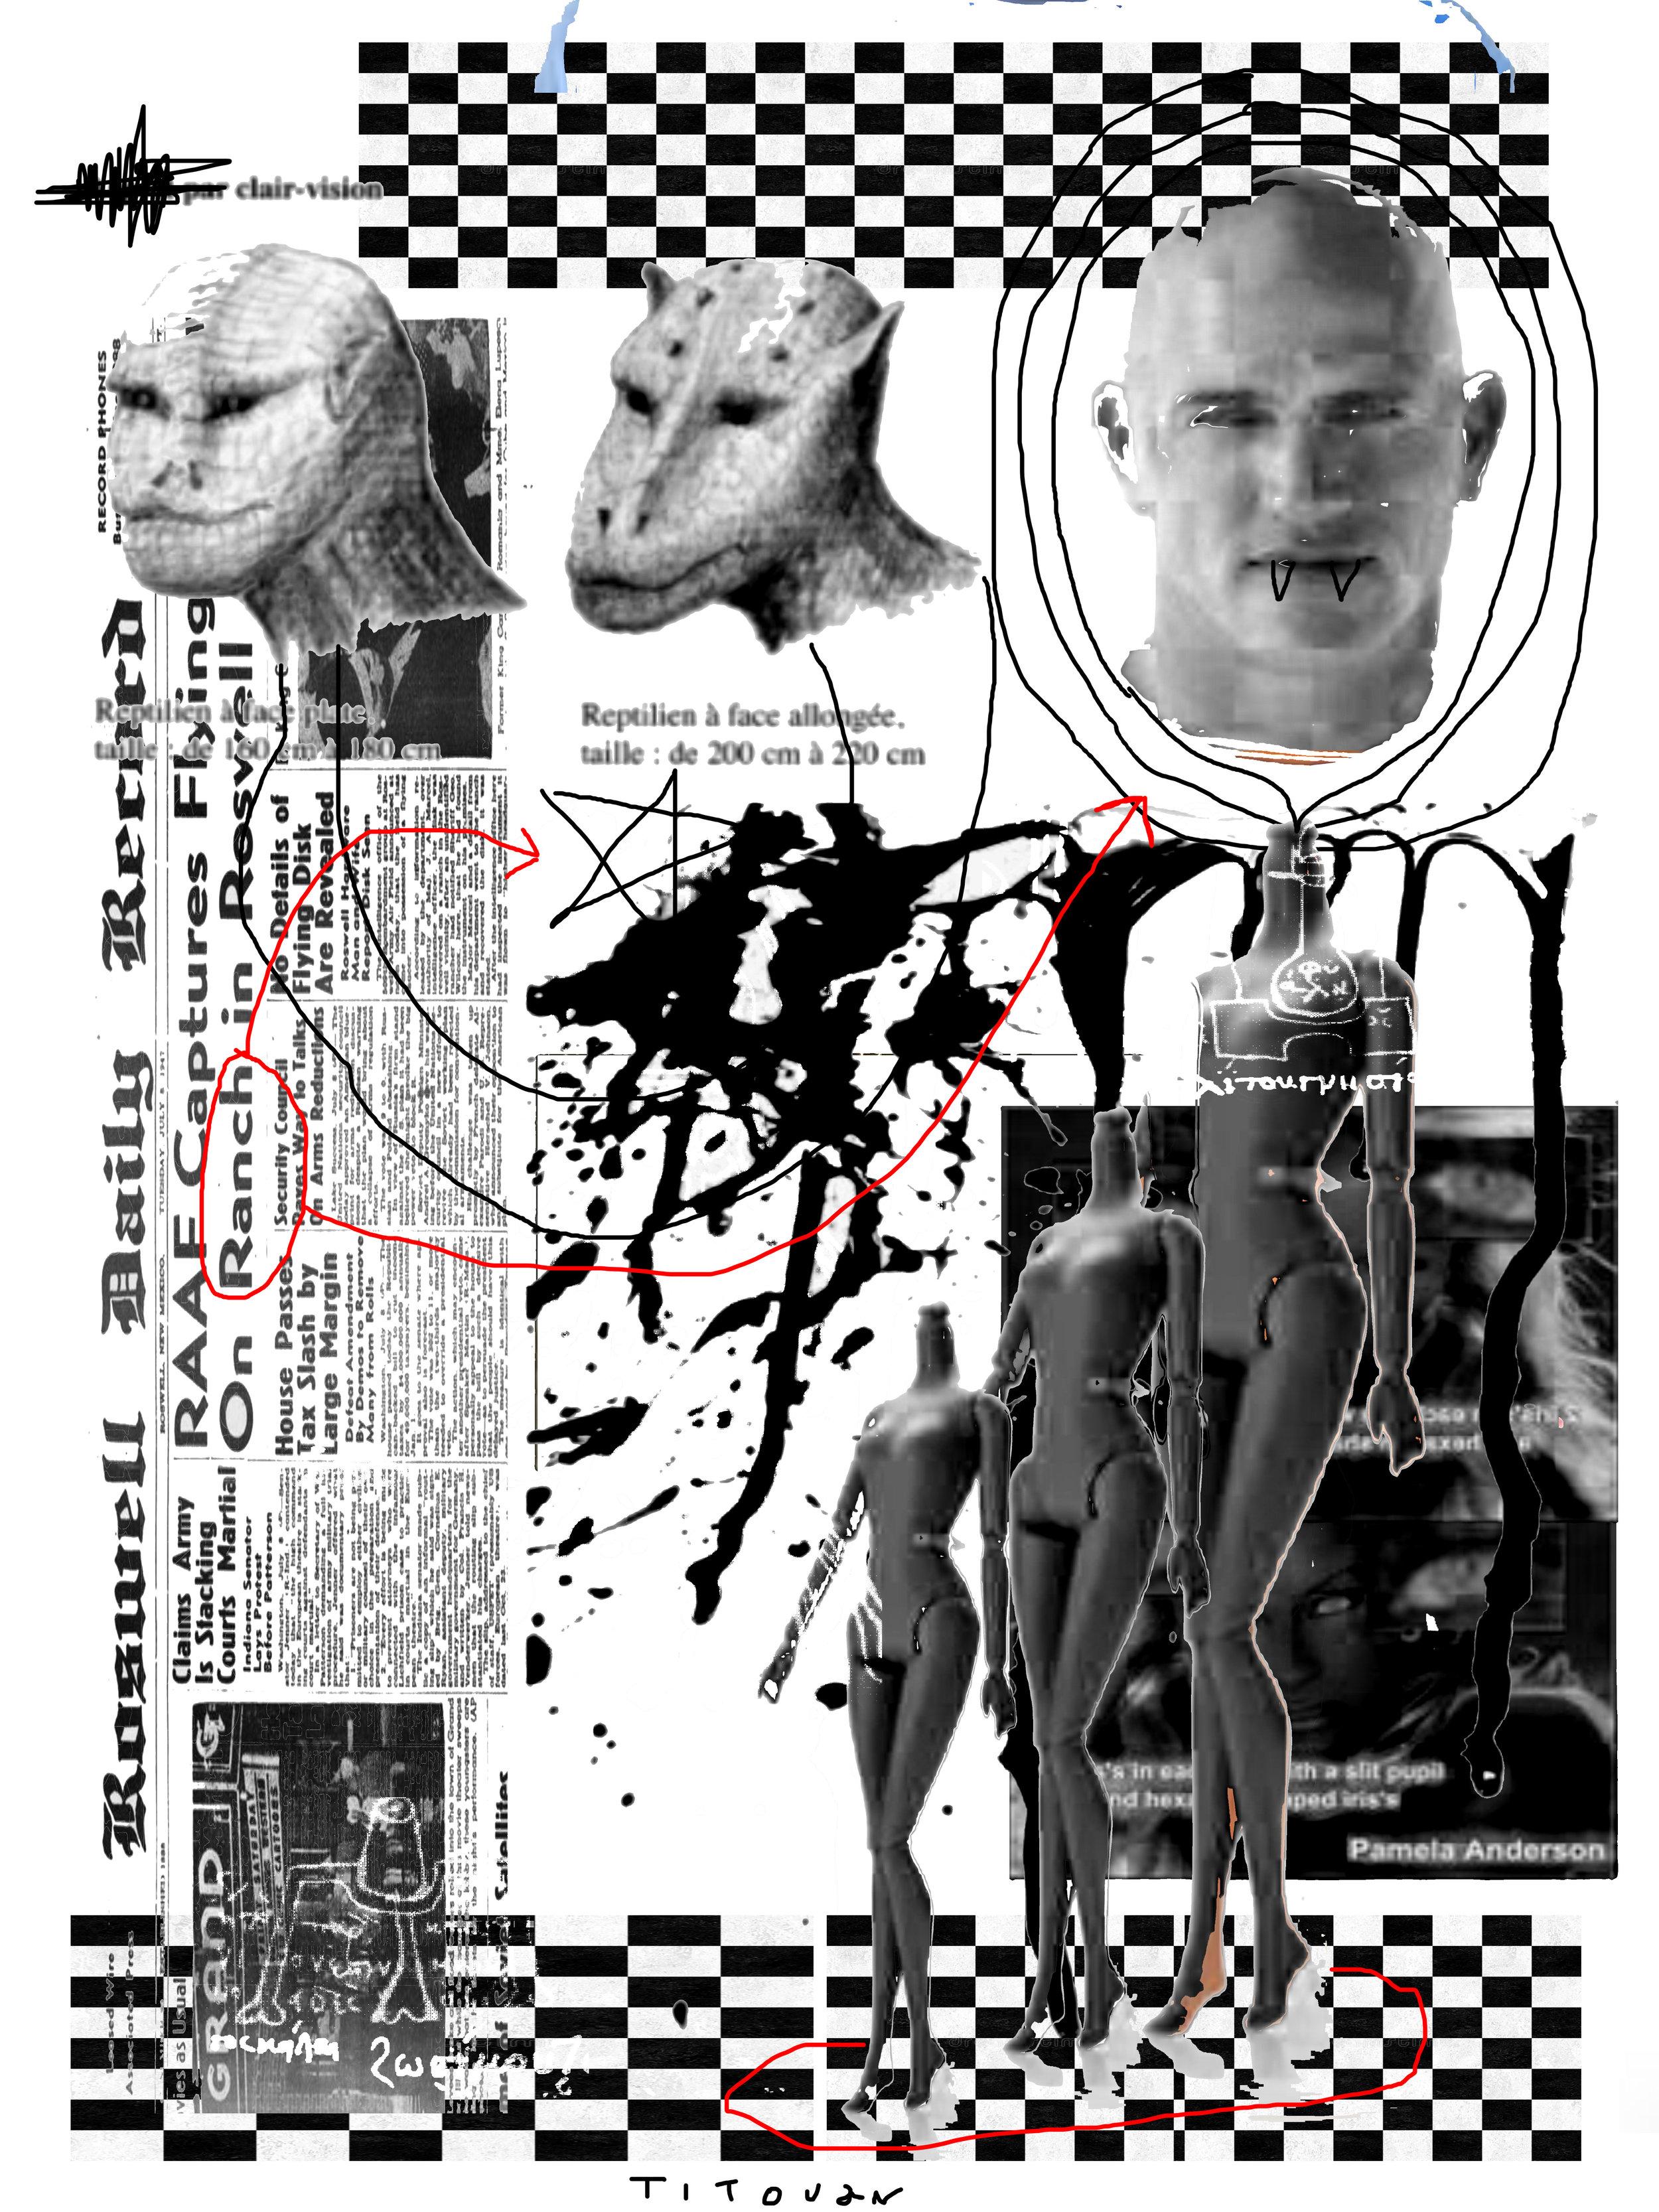 """The final exposé"" by our reptilian specialist Tito Lavole."